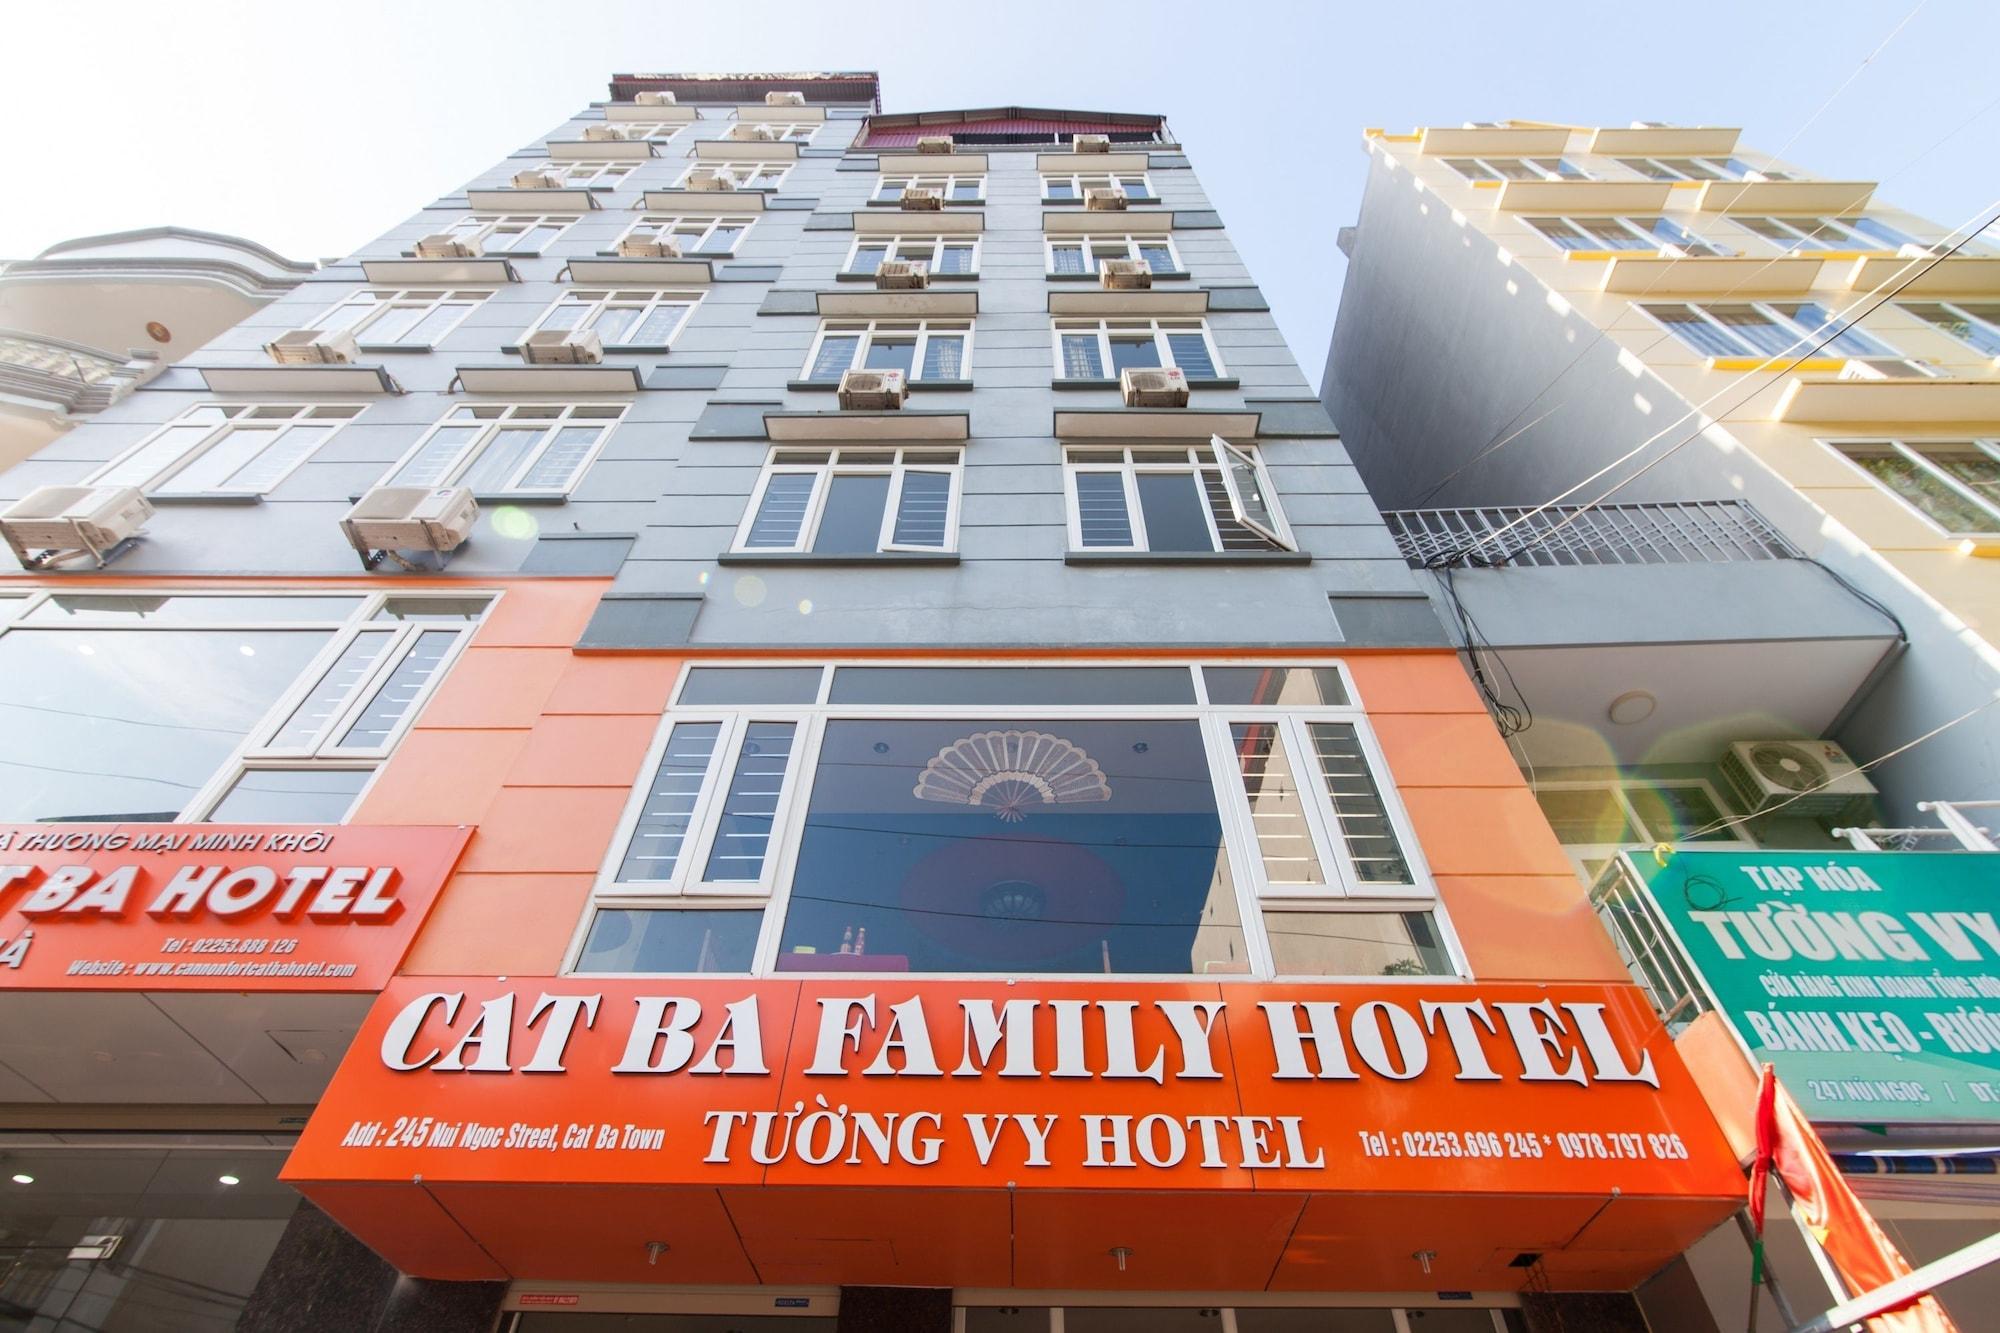 Cat Ba Family Hotel, Cát Hải